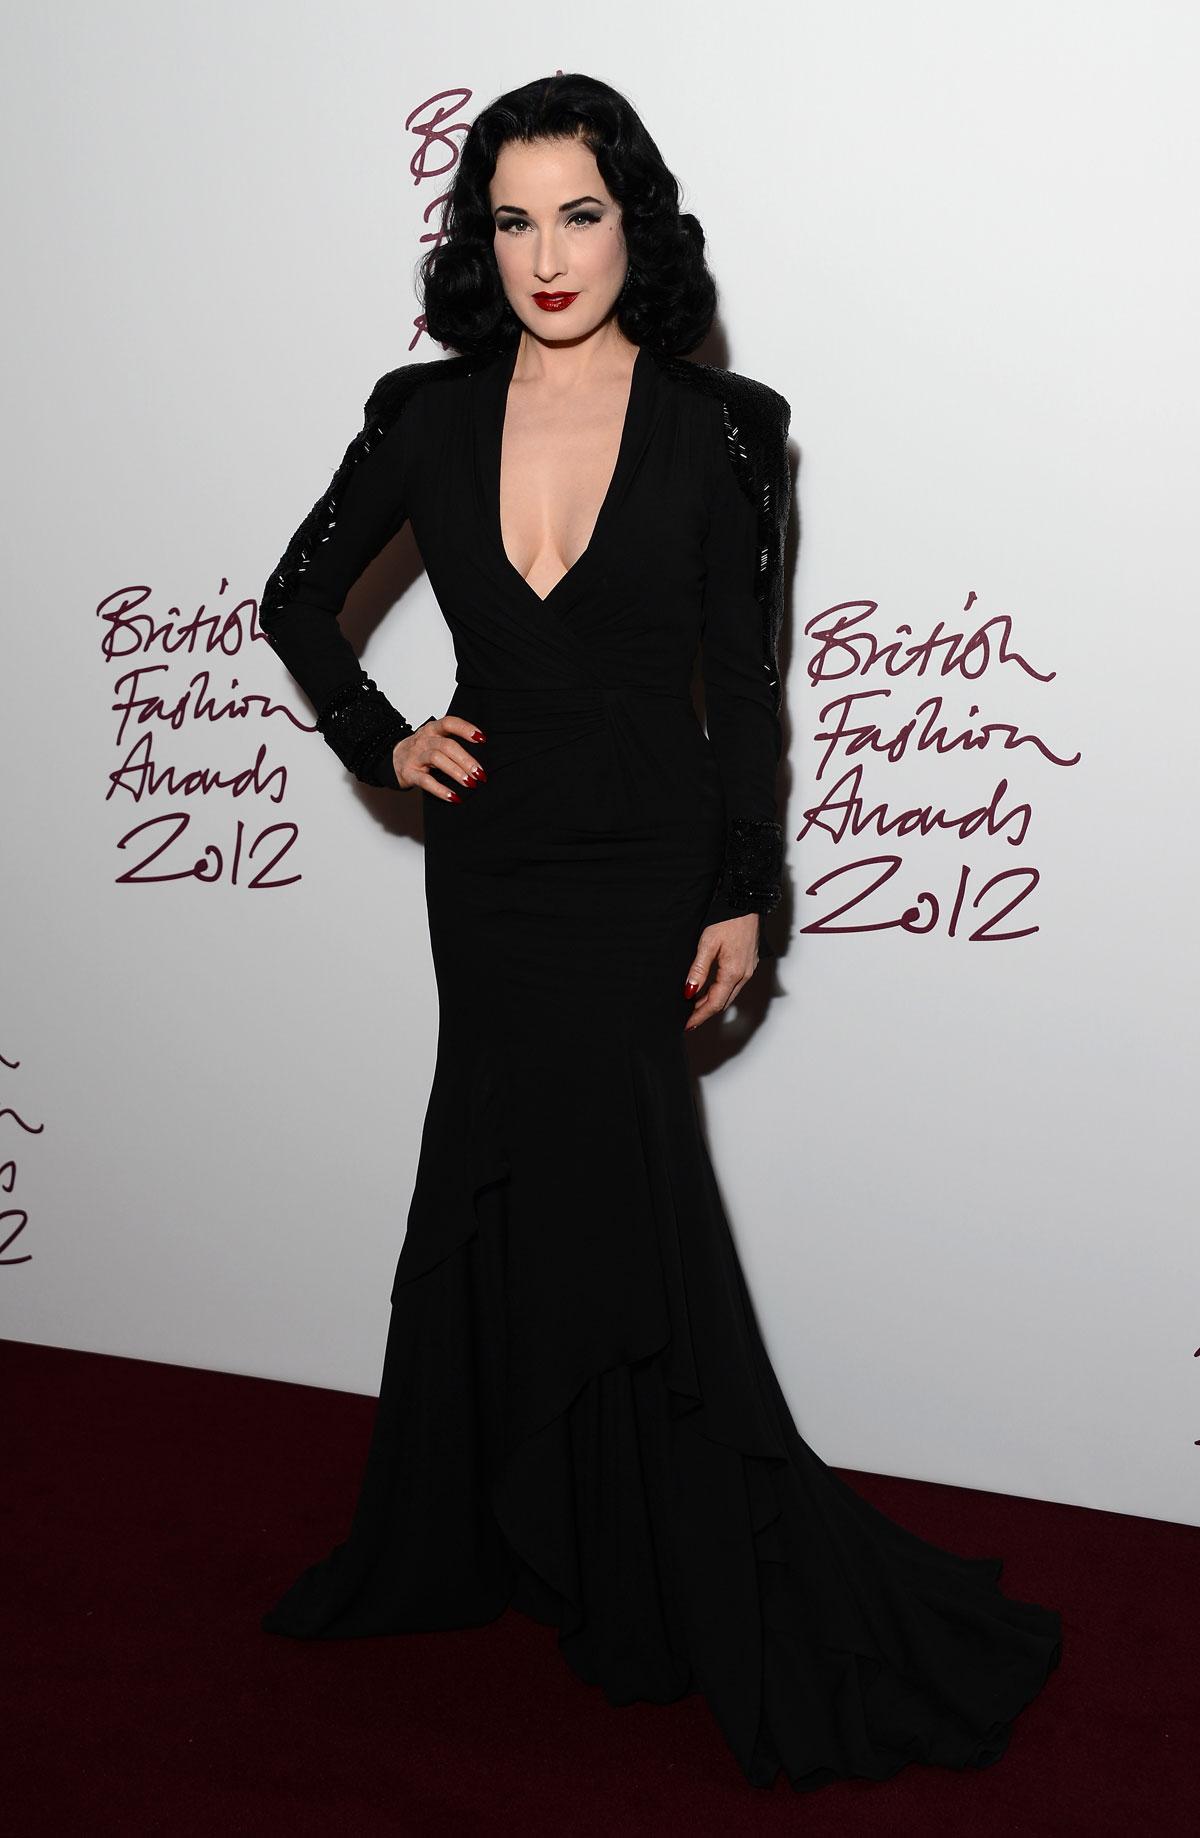 DITA Von TEESE at 2012 British Fashion Awards at the Savoy ... Dita Von Teese